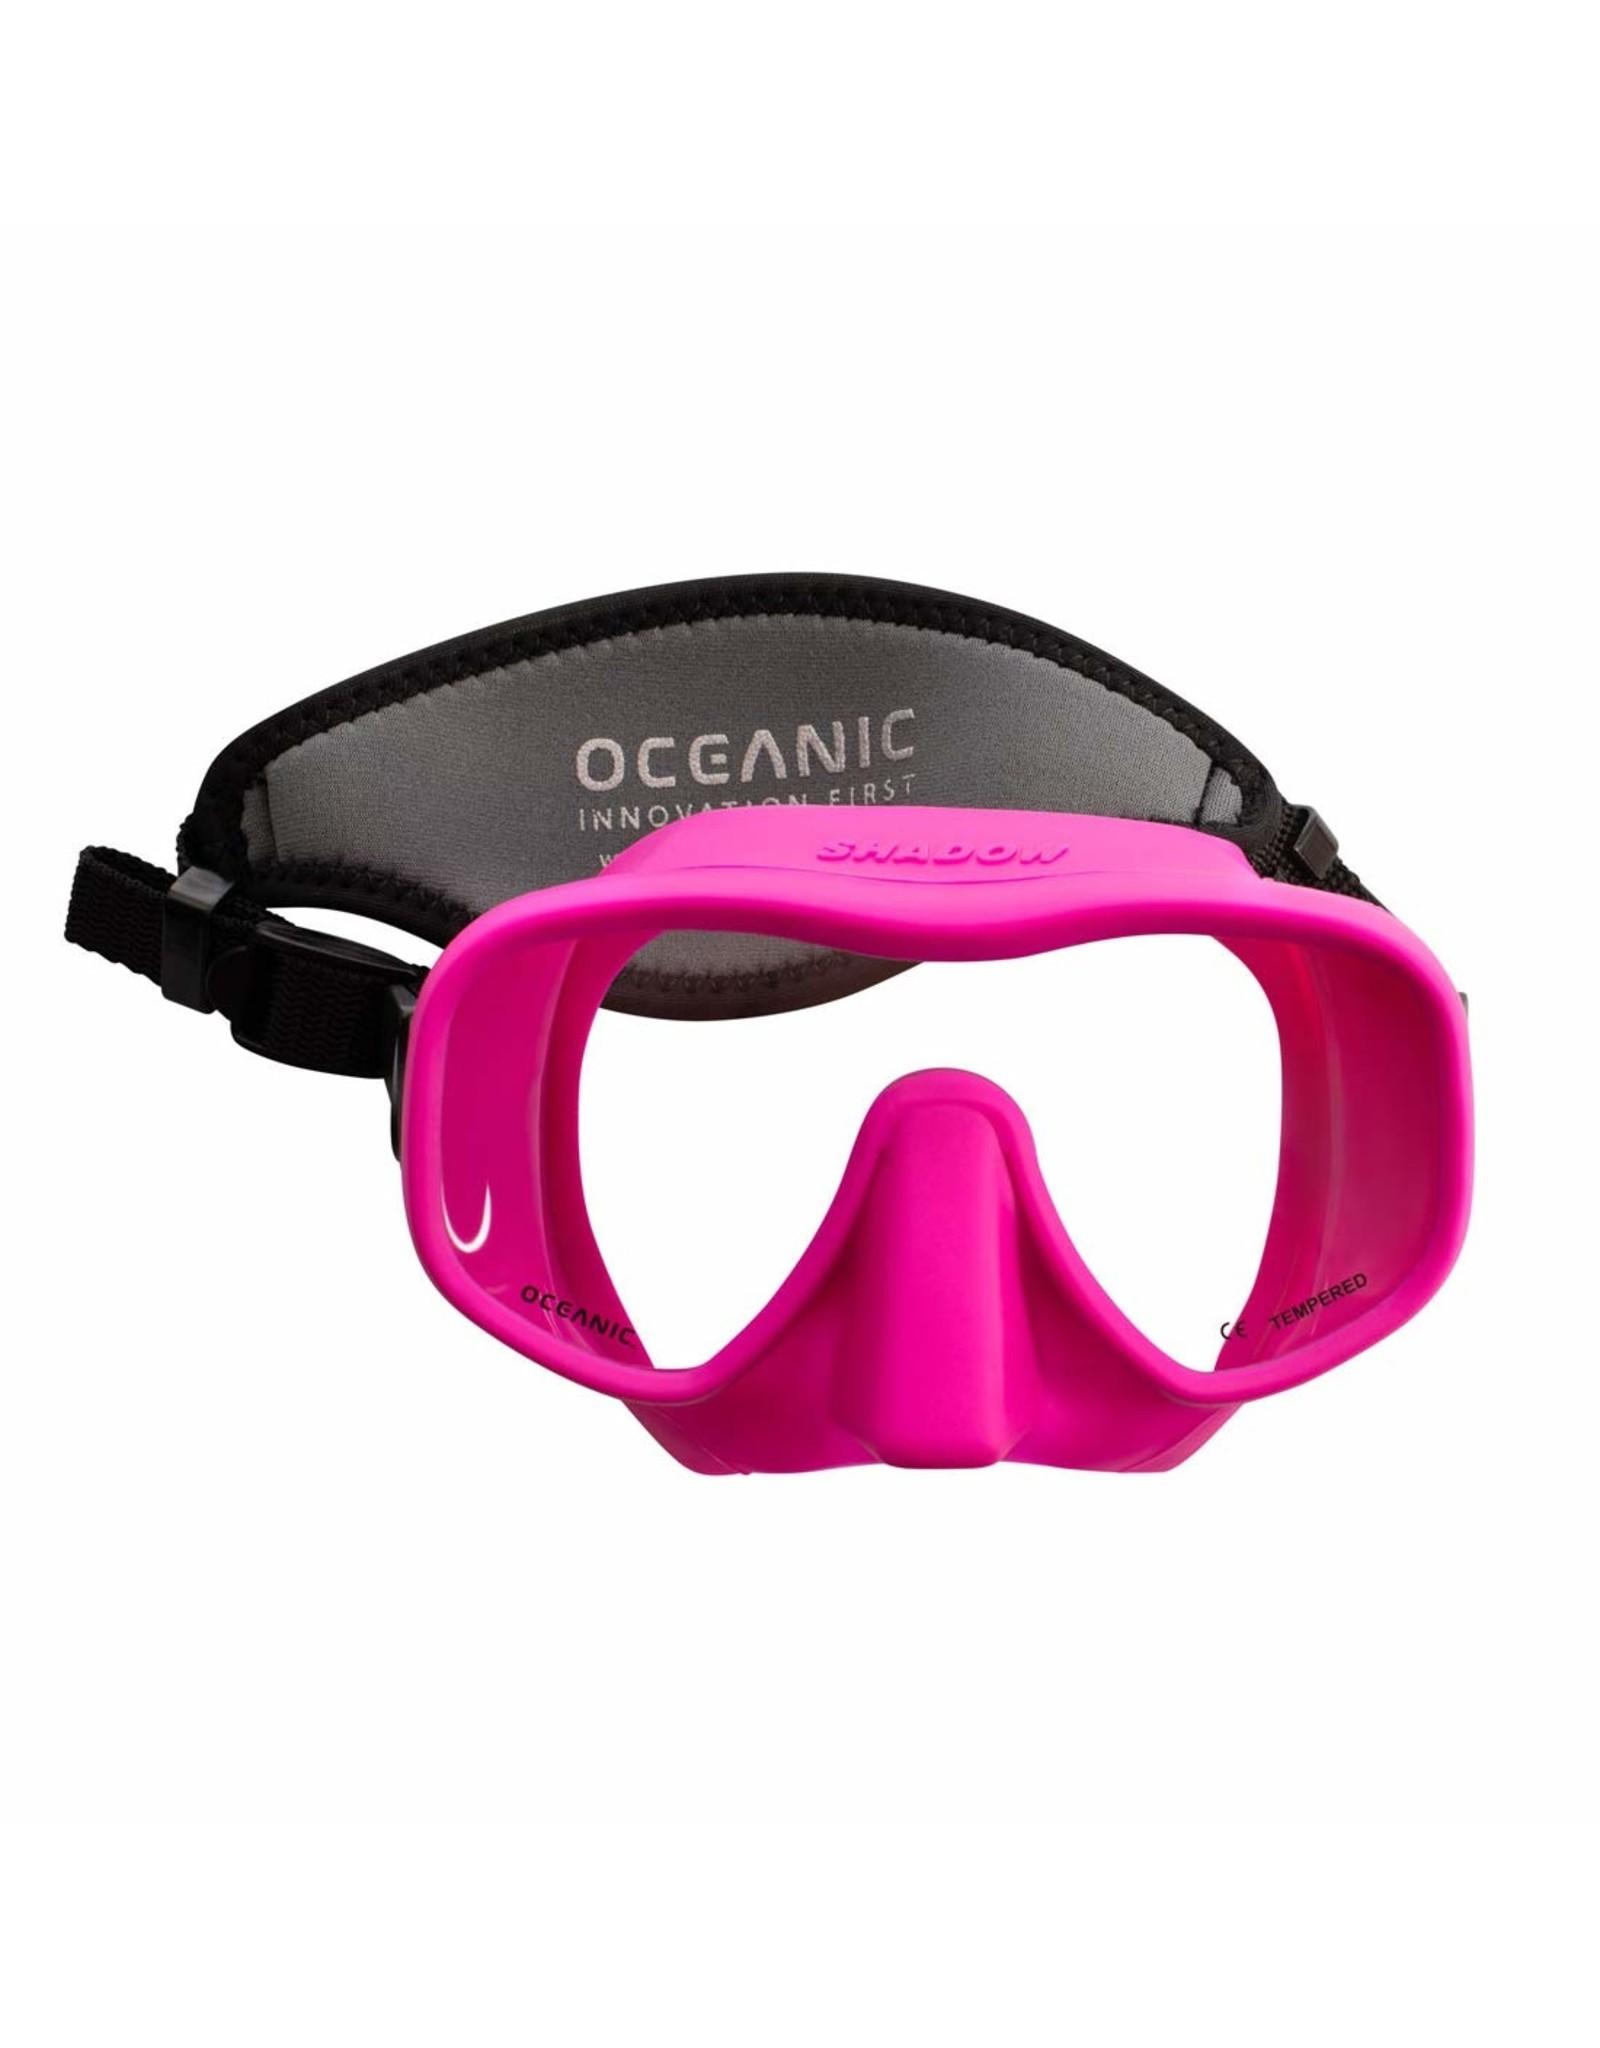 Oceanic Oceanic Shadow Mini